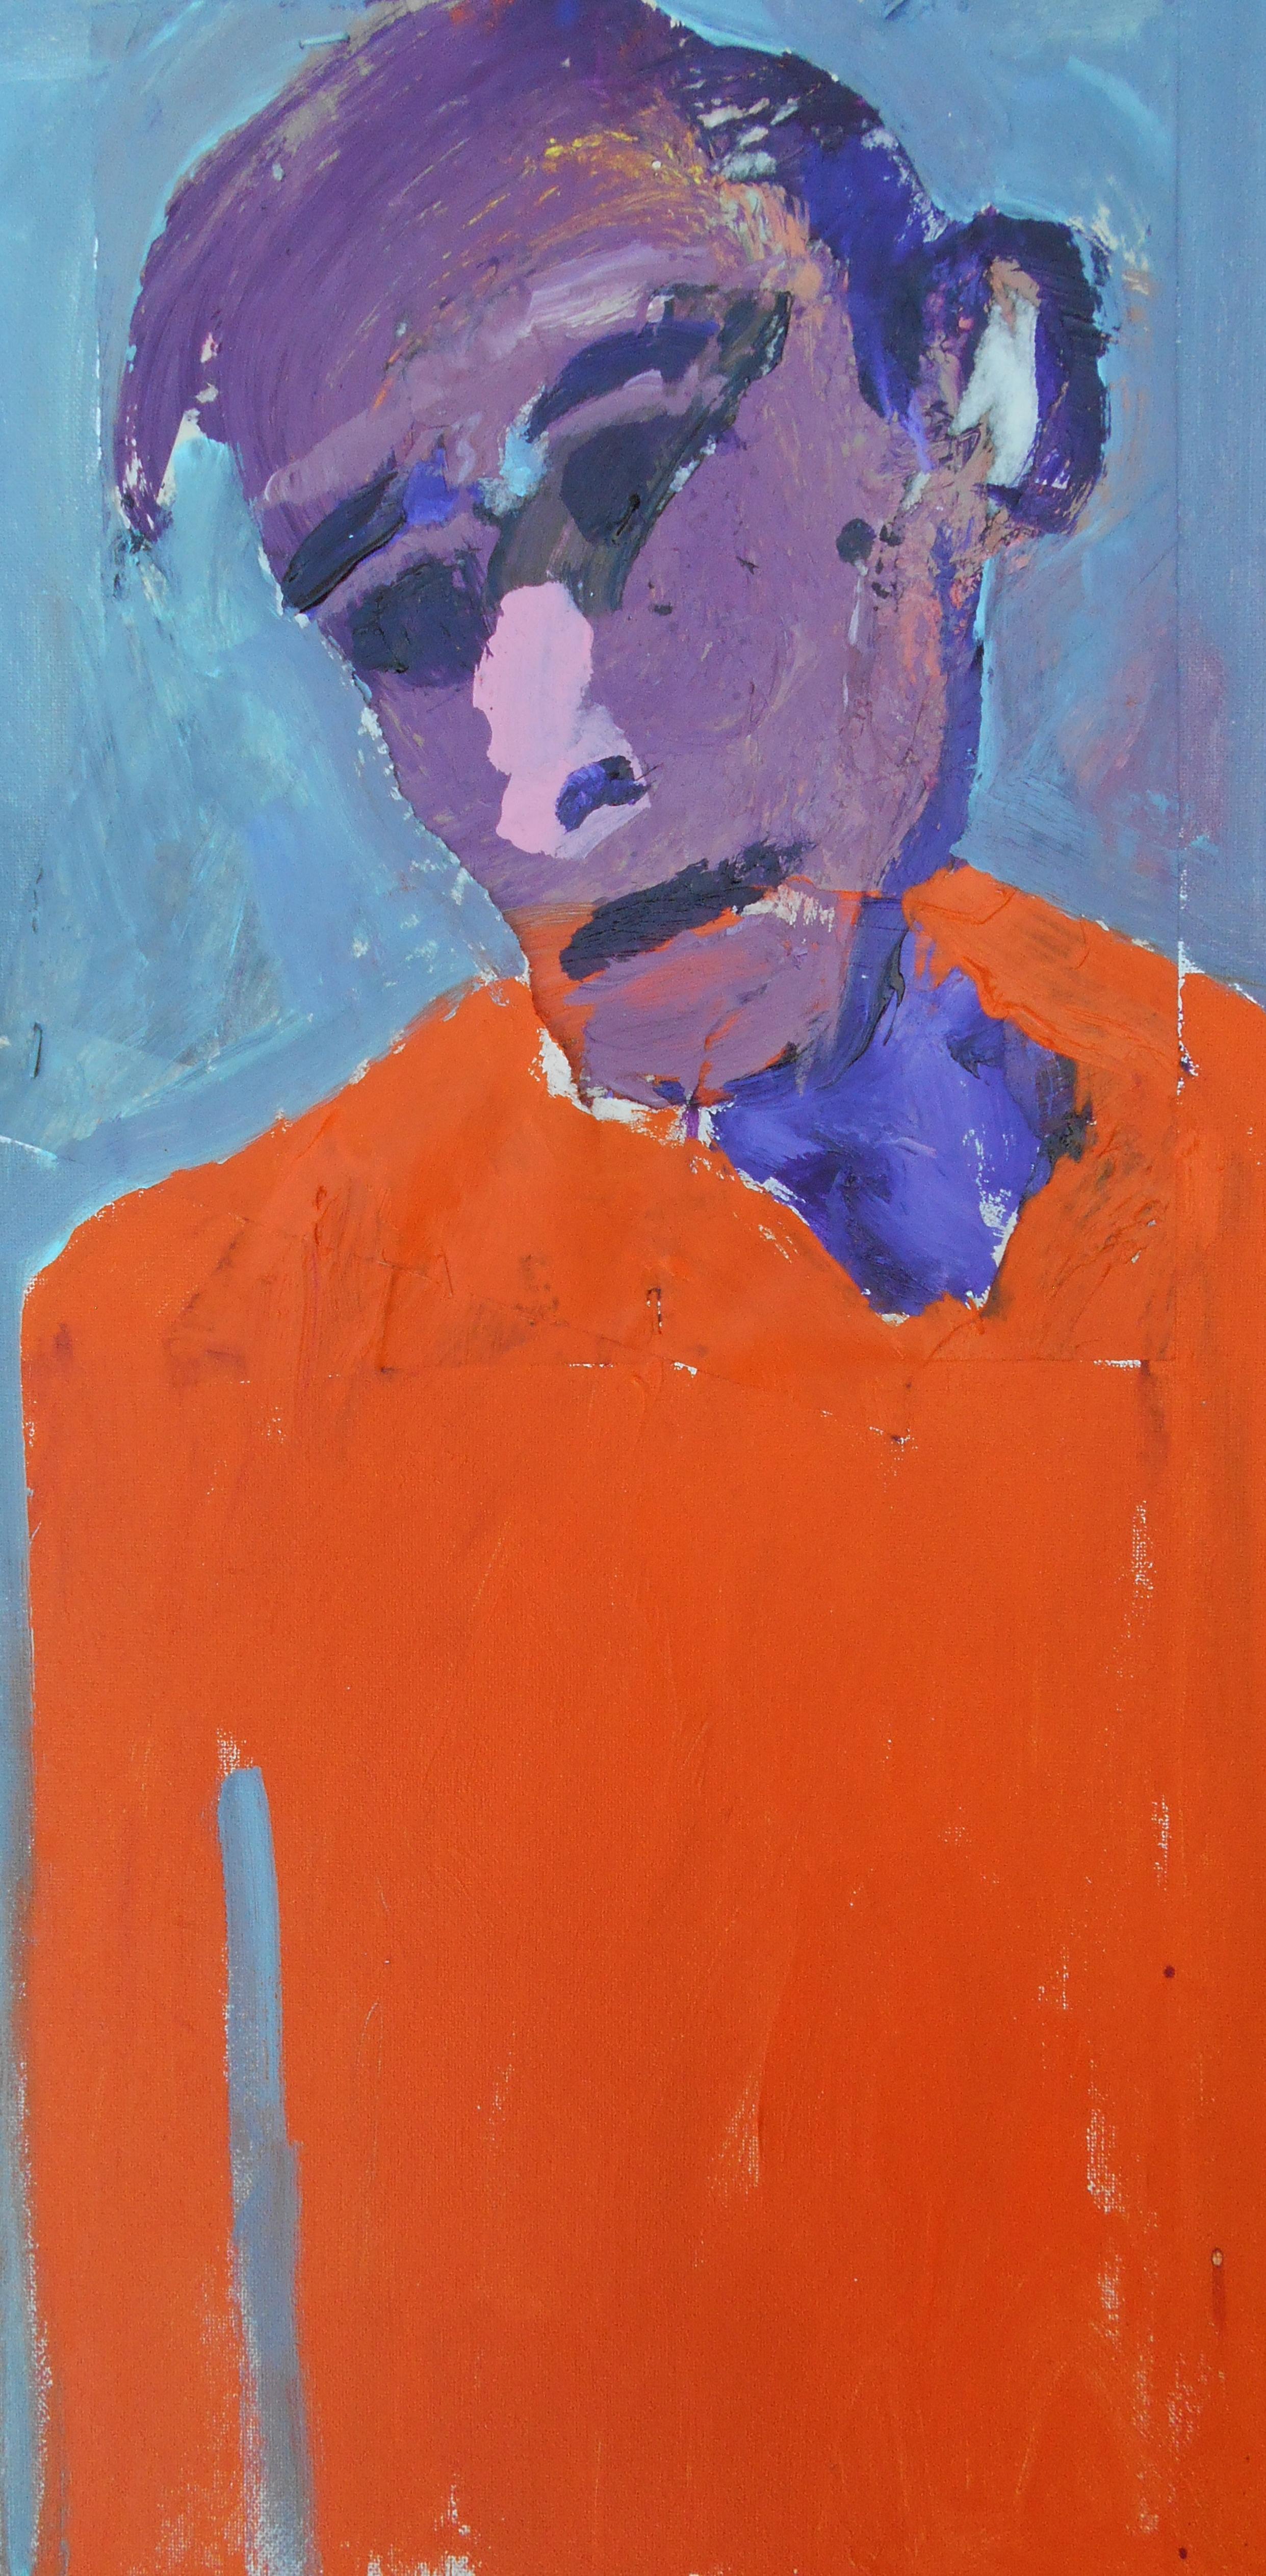 #6 Stephen Perrone - Man in Orange Pullover - 2018 - 24x12 - a on c _ paper - $450.JPG